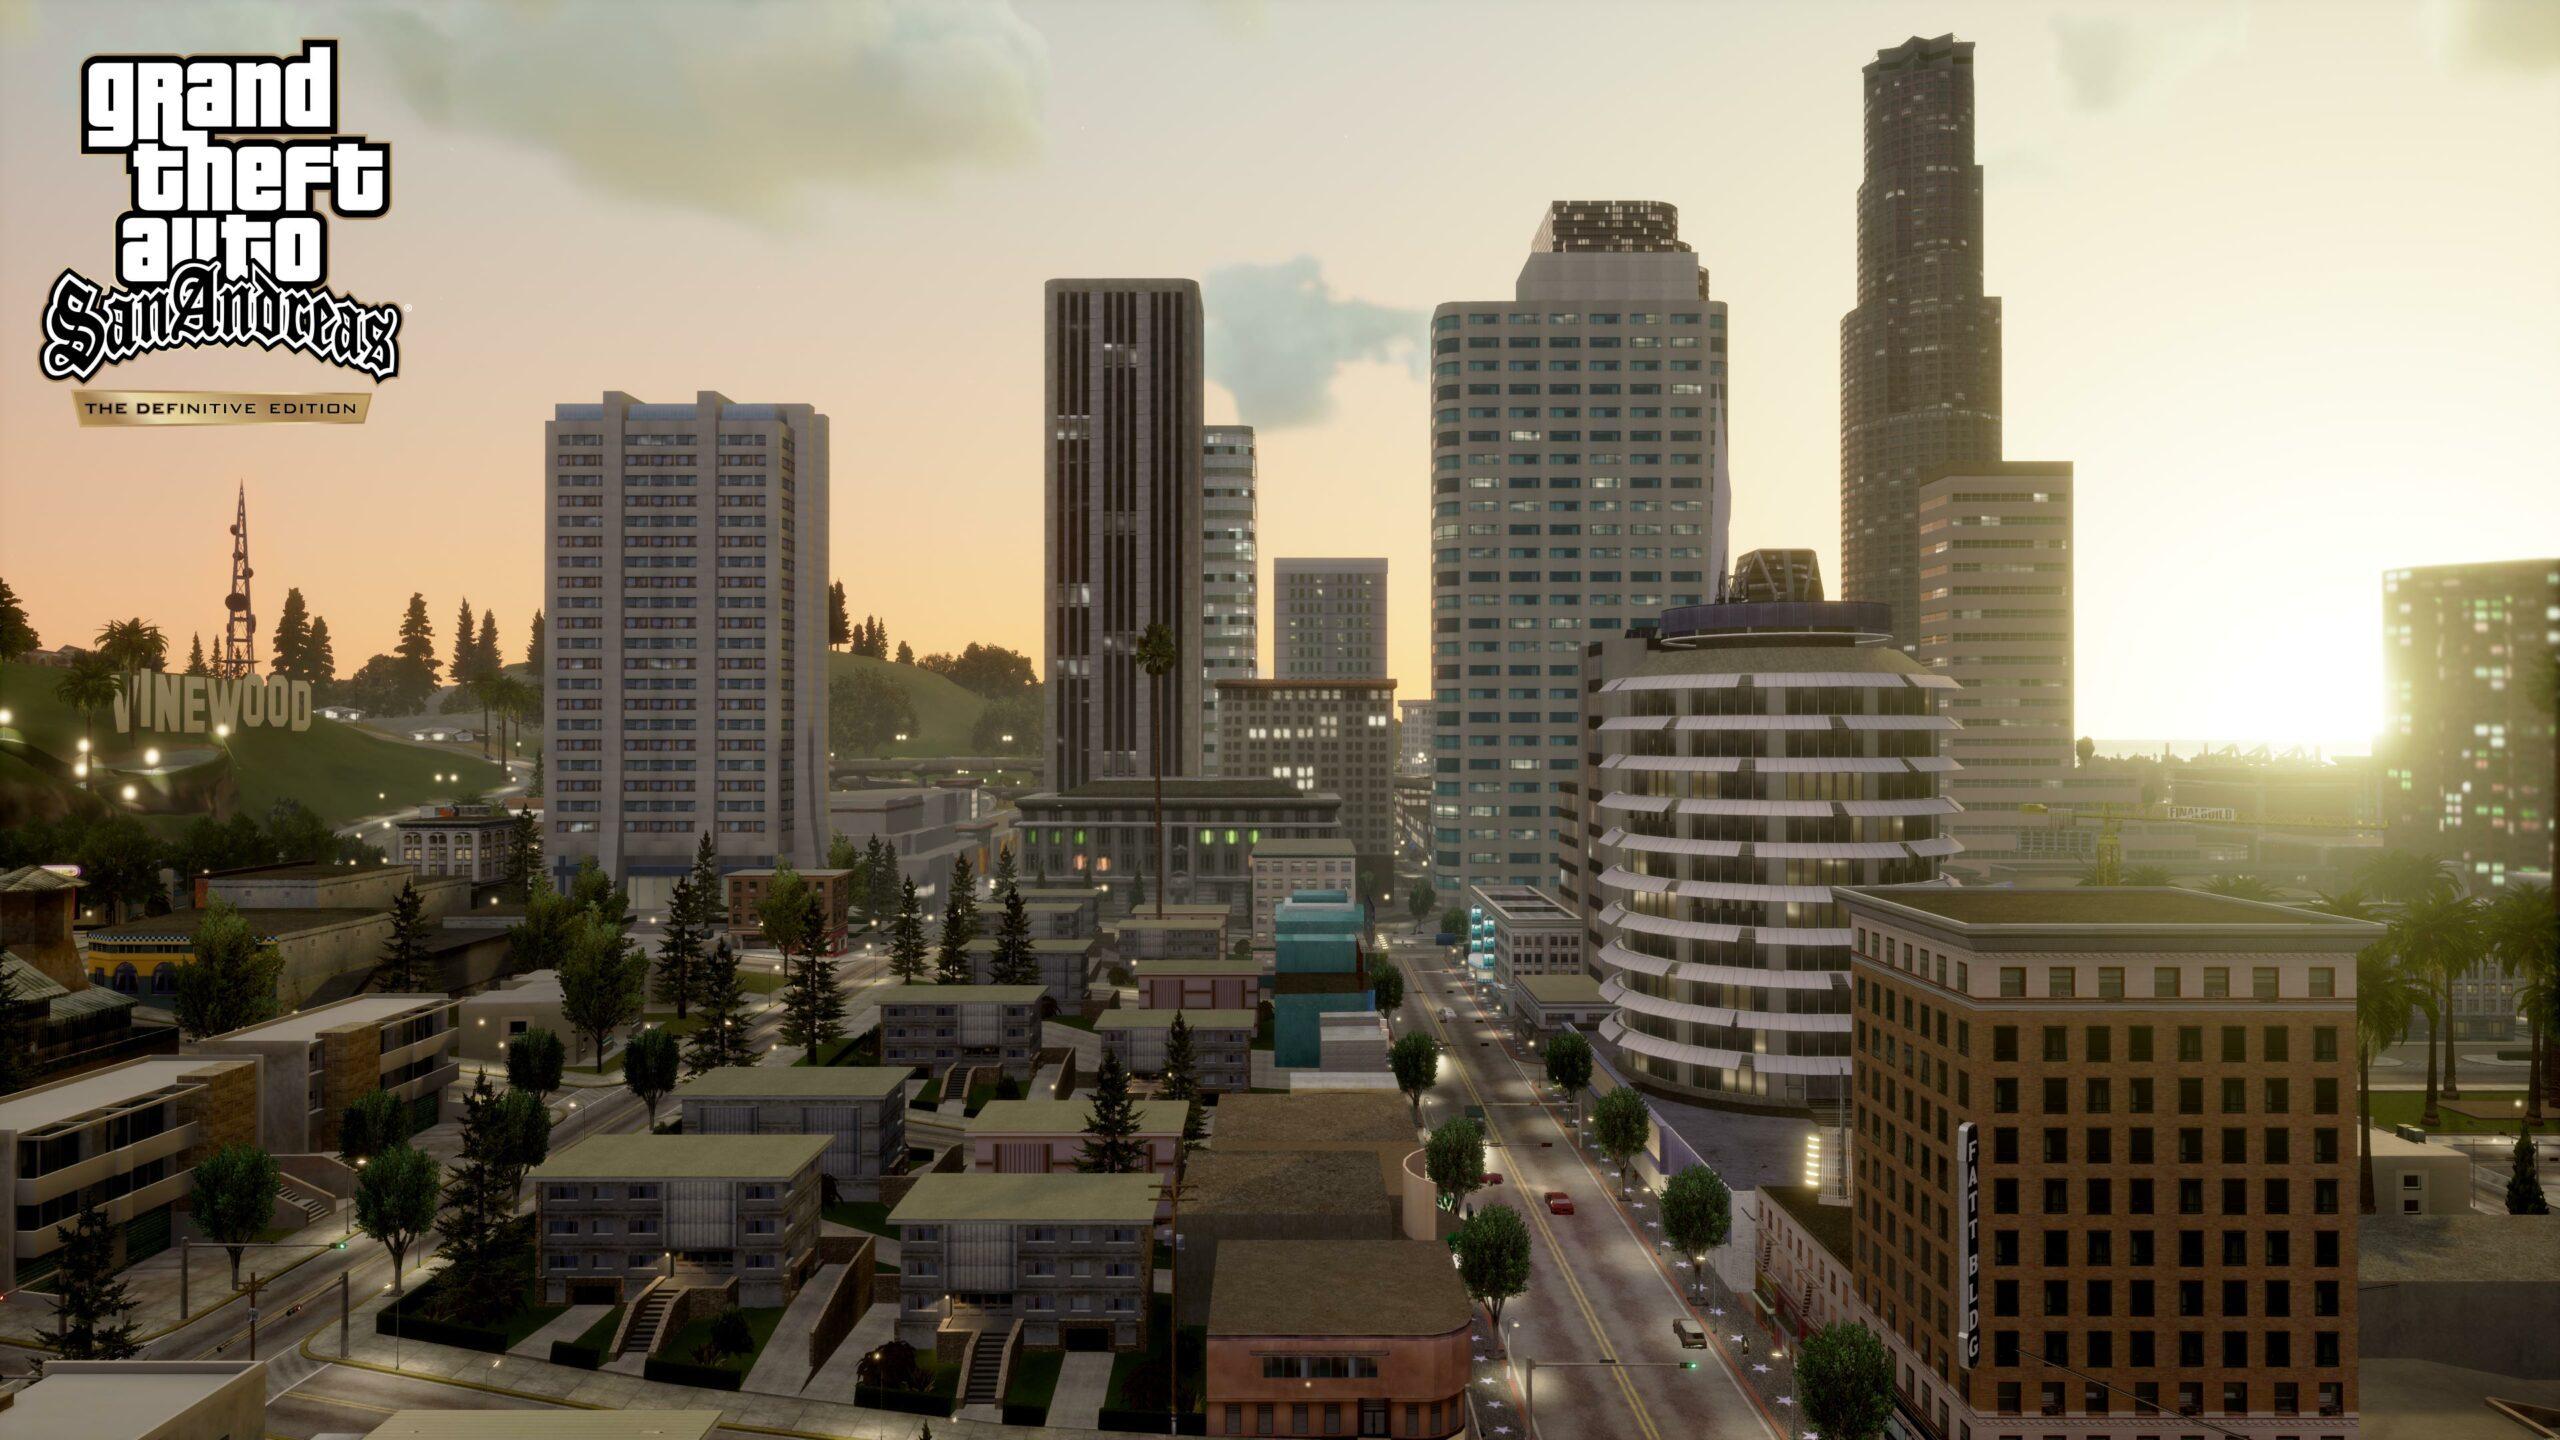 GTA San Andreas The Definitive Edition